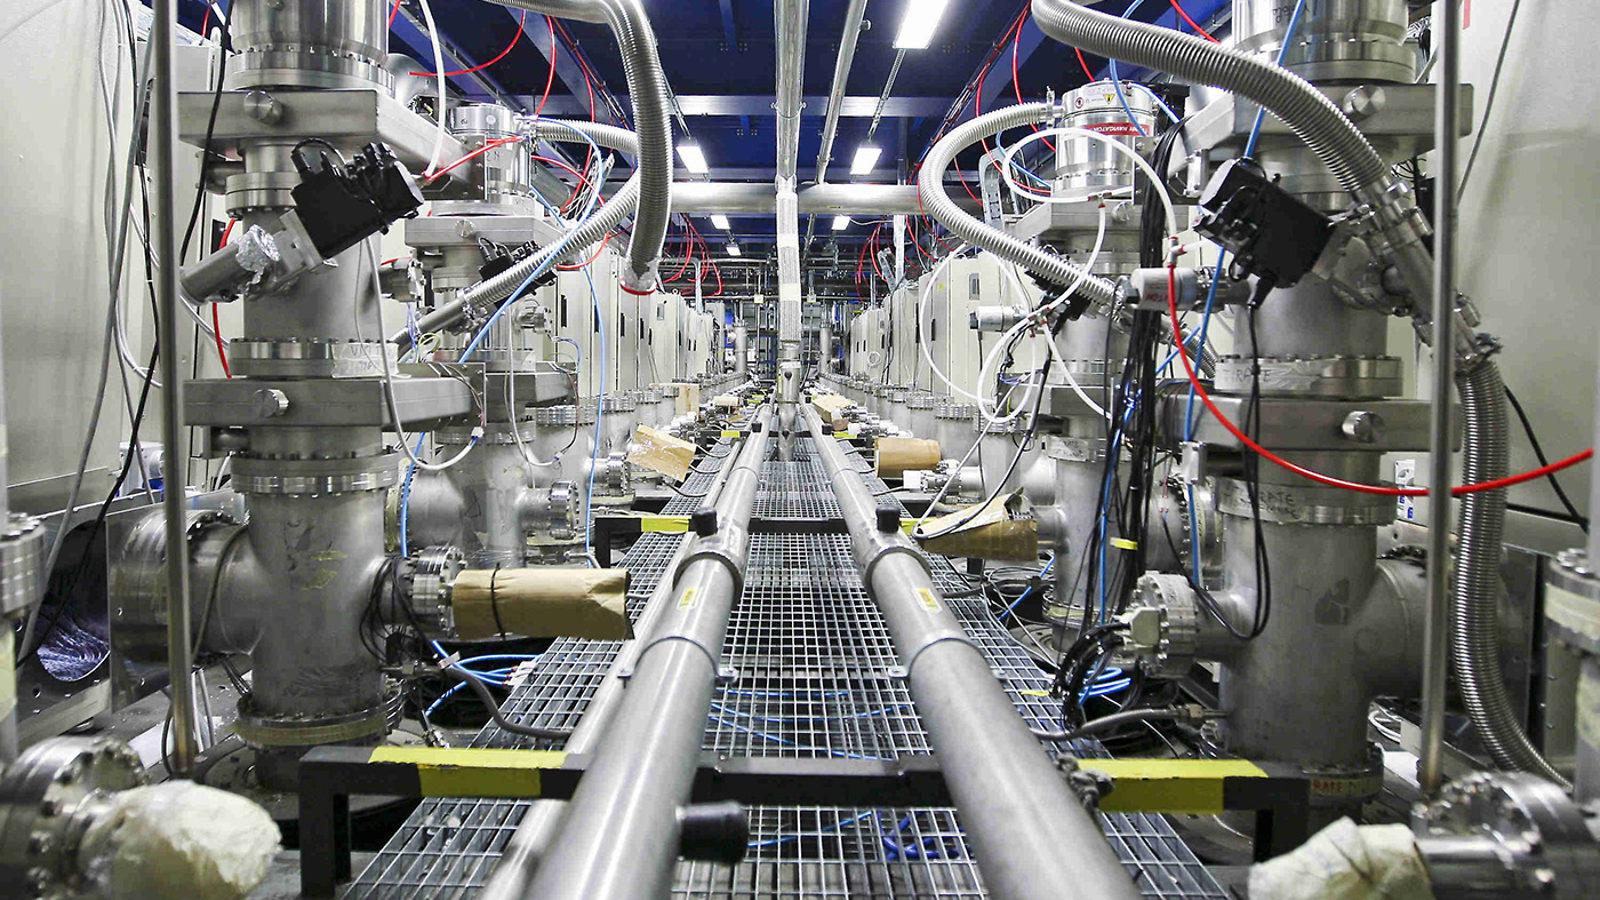 Italian neutrino experiment to move to the US symmetry magazine 1600x900